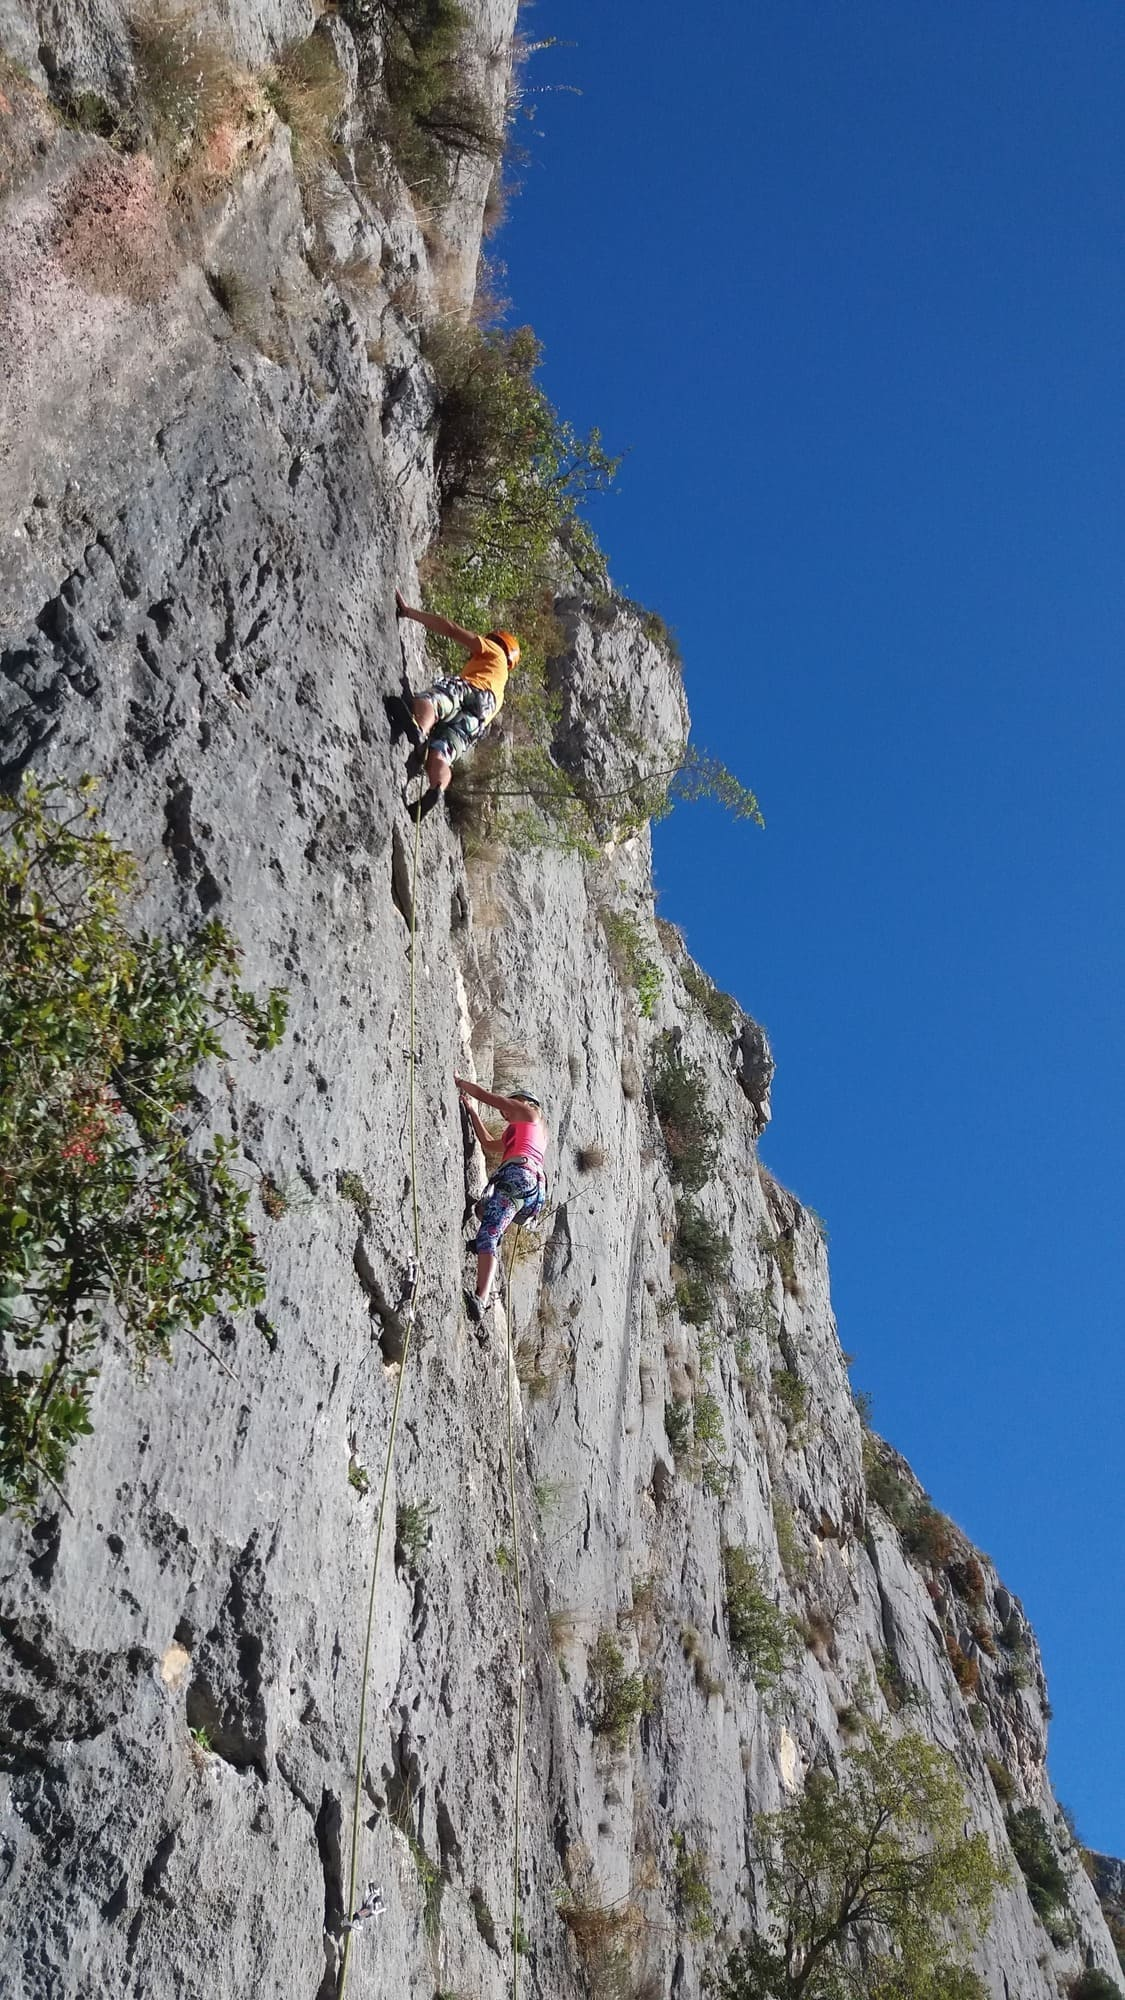 Rock Climbing & Zipline Šibenik - Čikola Canyon